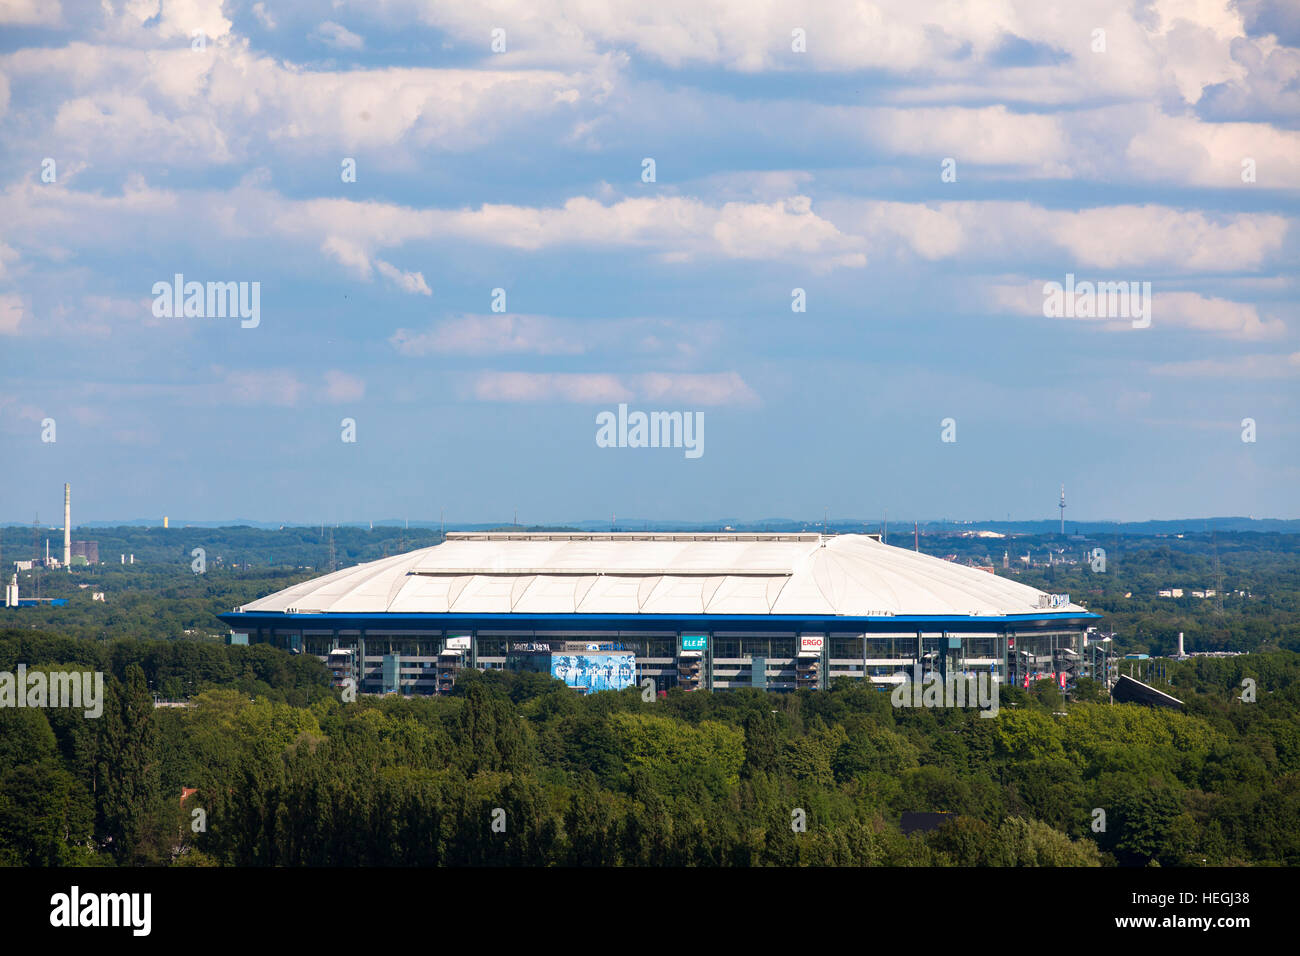 Germany, Gelsenkirchen, the soccer stadium Veltins-Arena, Arena auf Schalke. - Stock Image